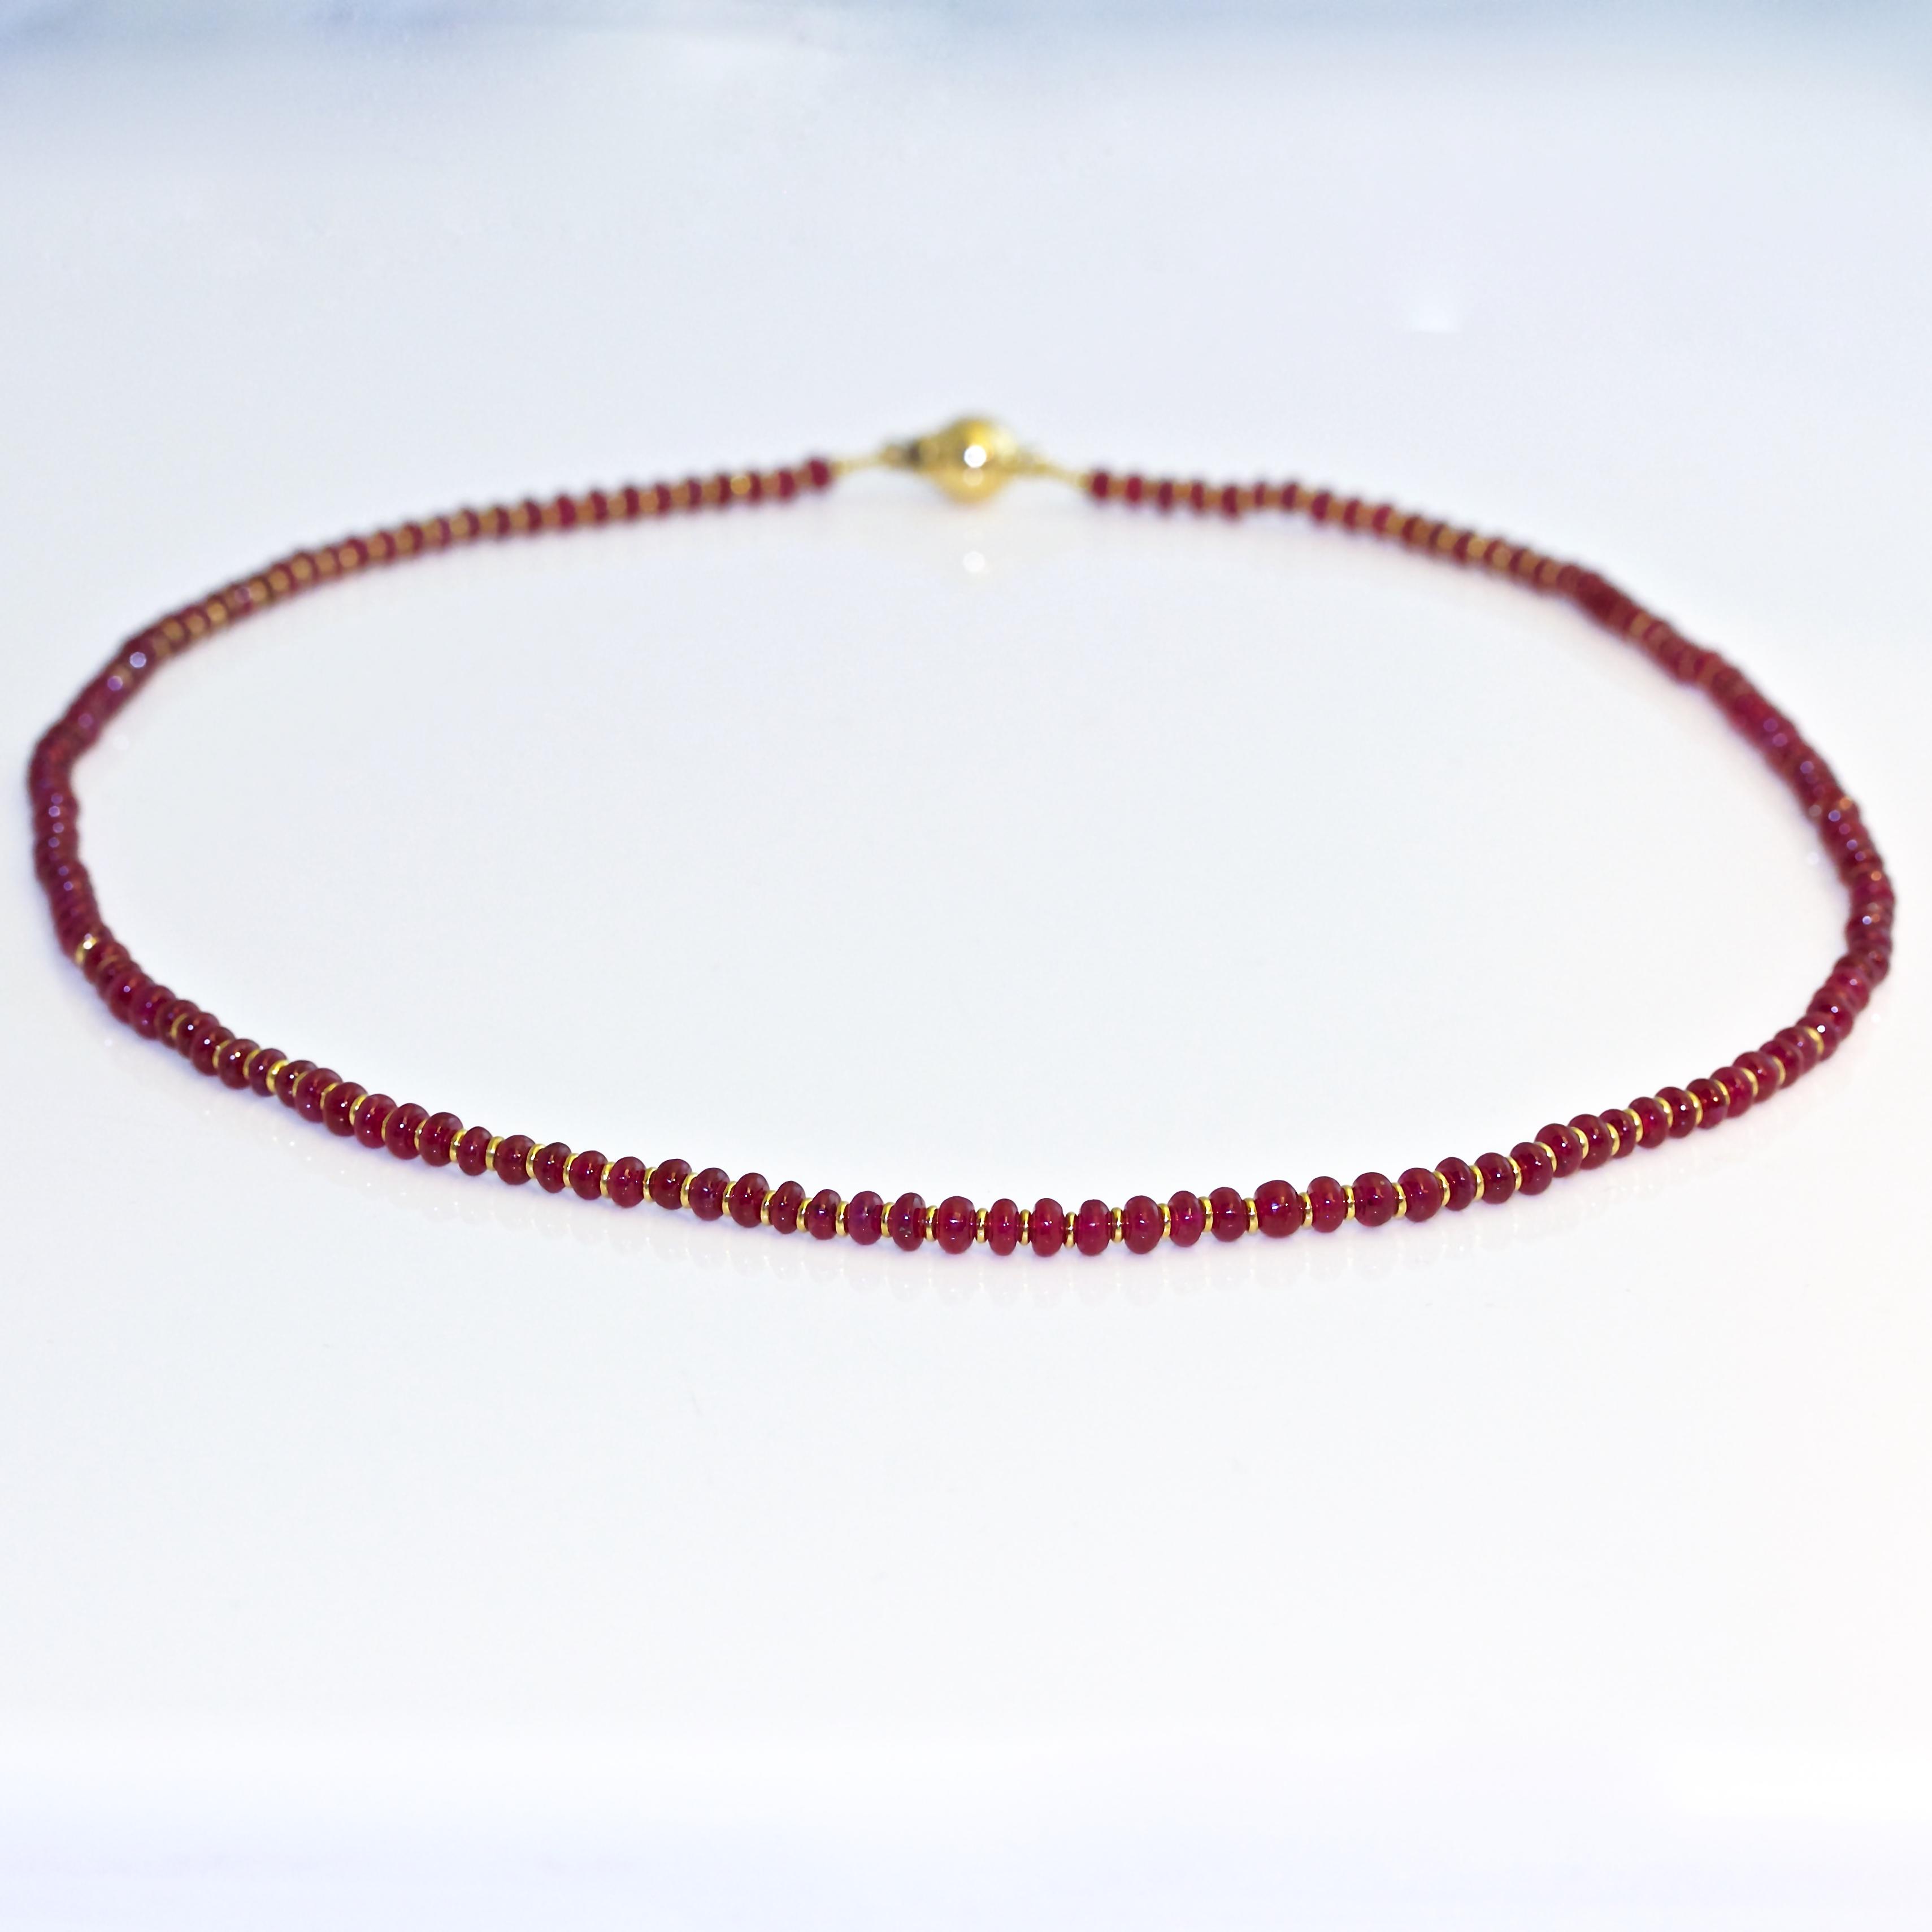 Ruby 18ct Gold Necklace David Ashton Contemporary Fine Jewellery